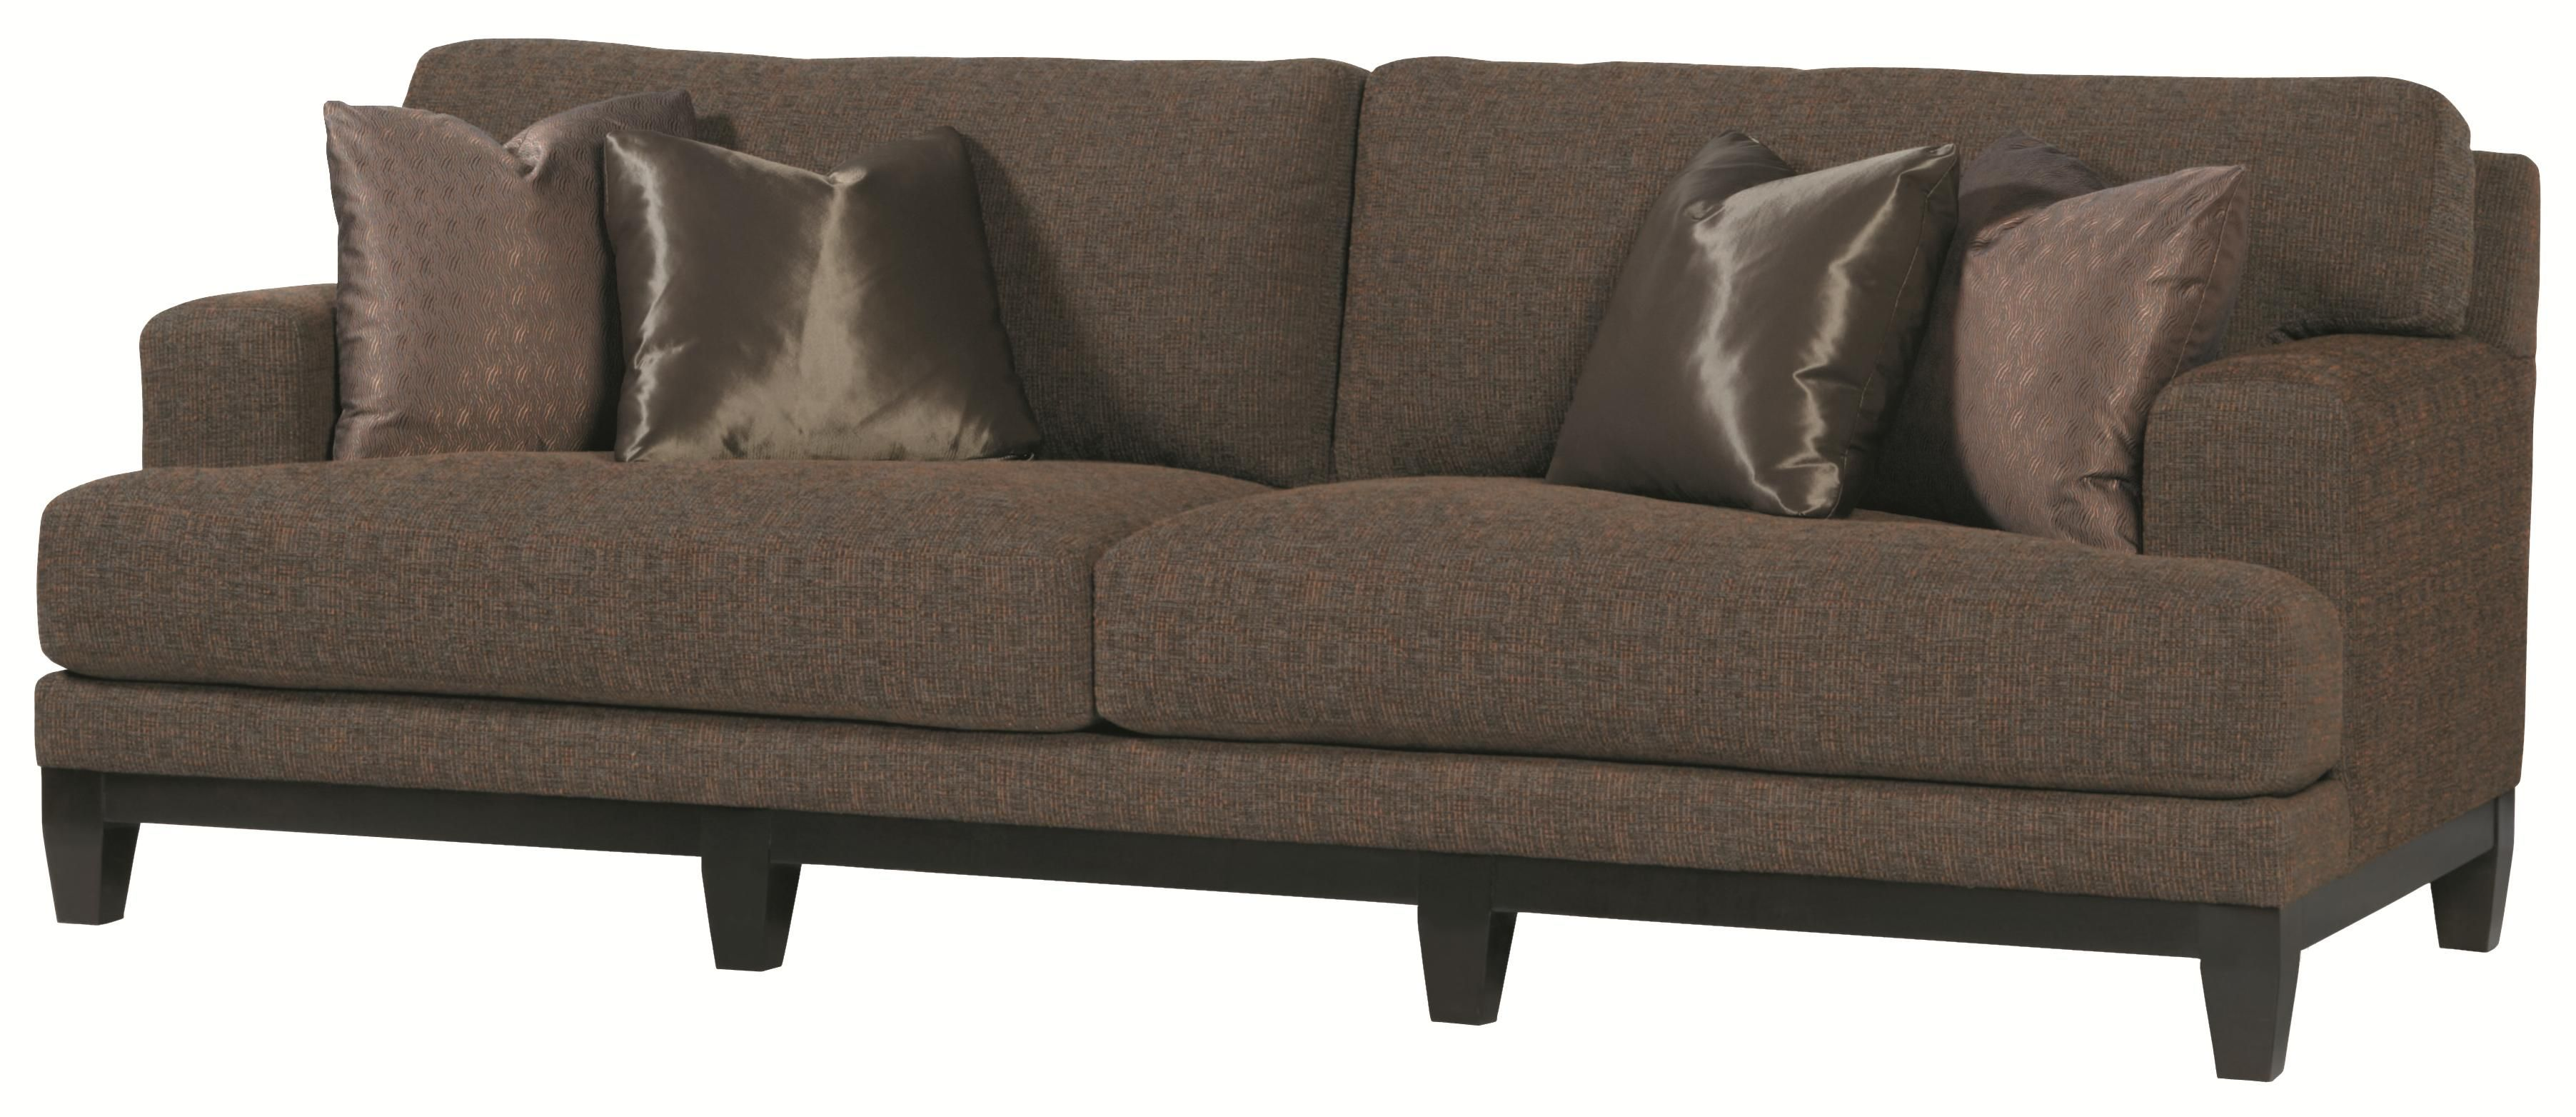 Barrie Sofa by Bernhardt | Sofa, Love seat, Home decor